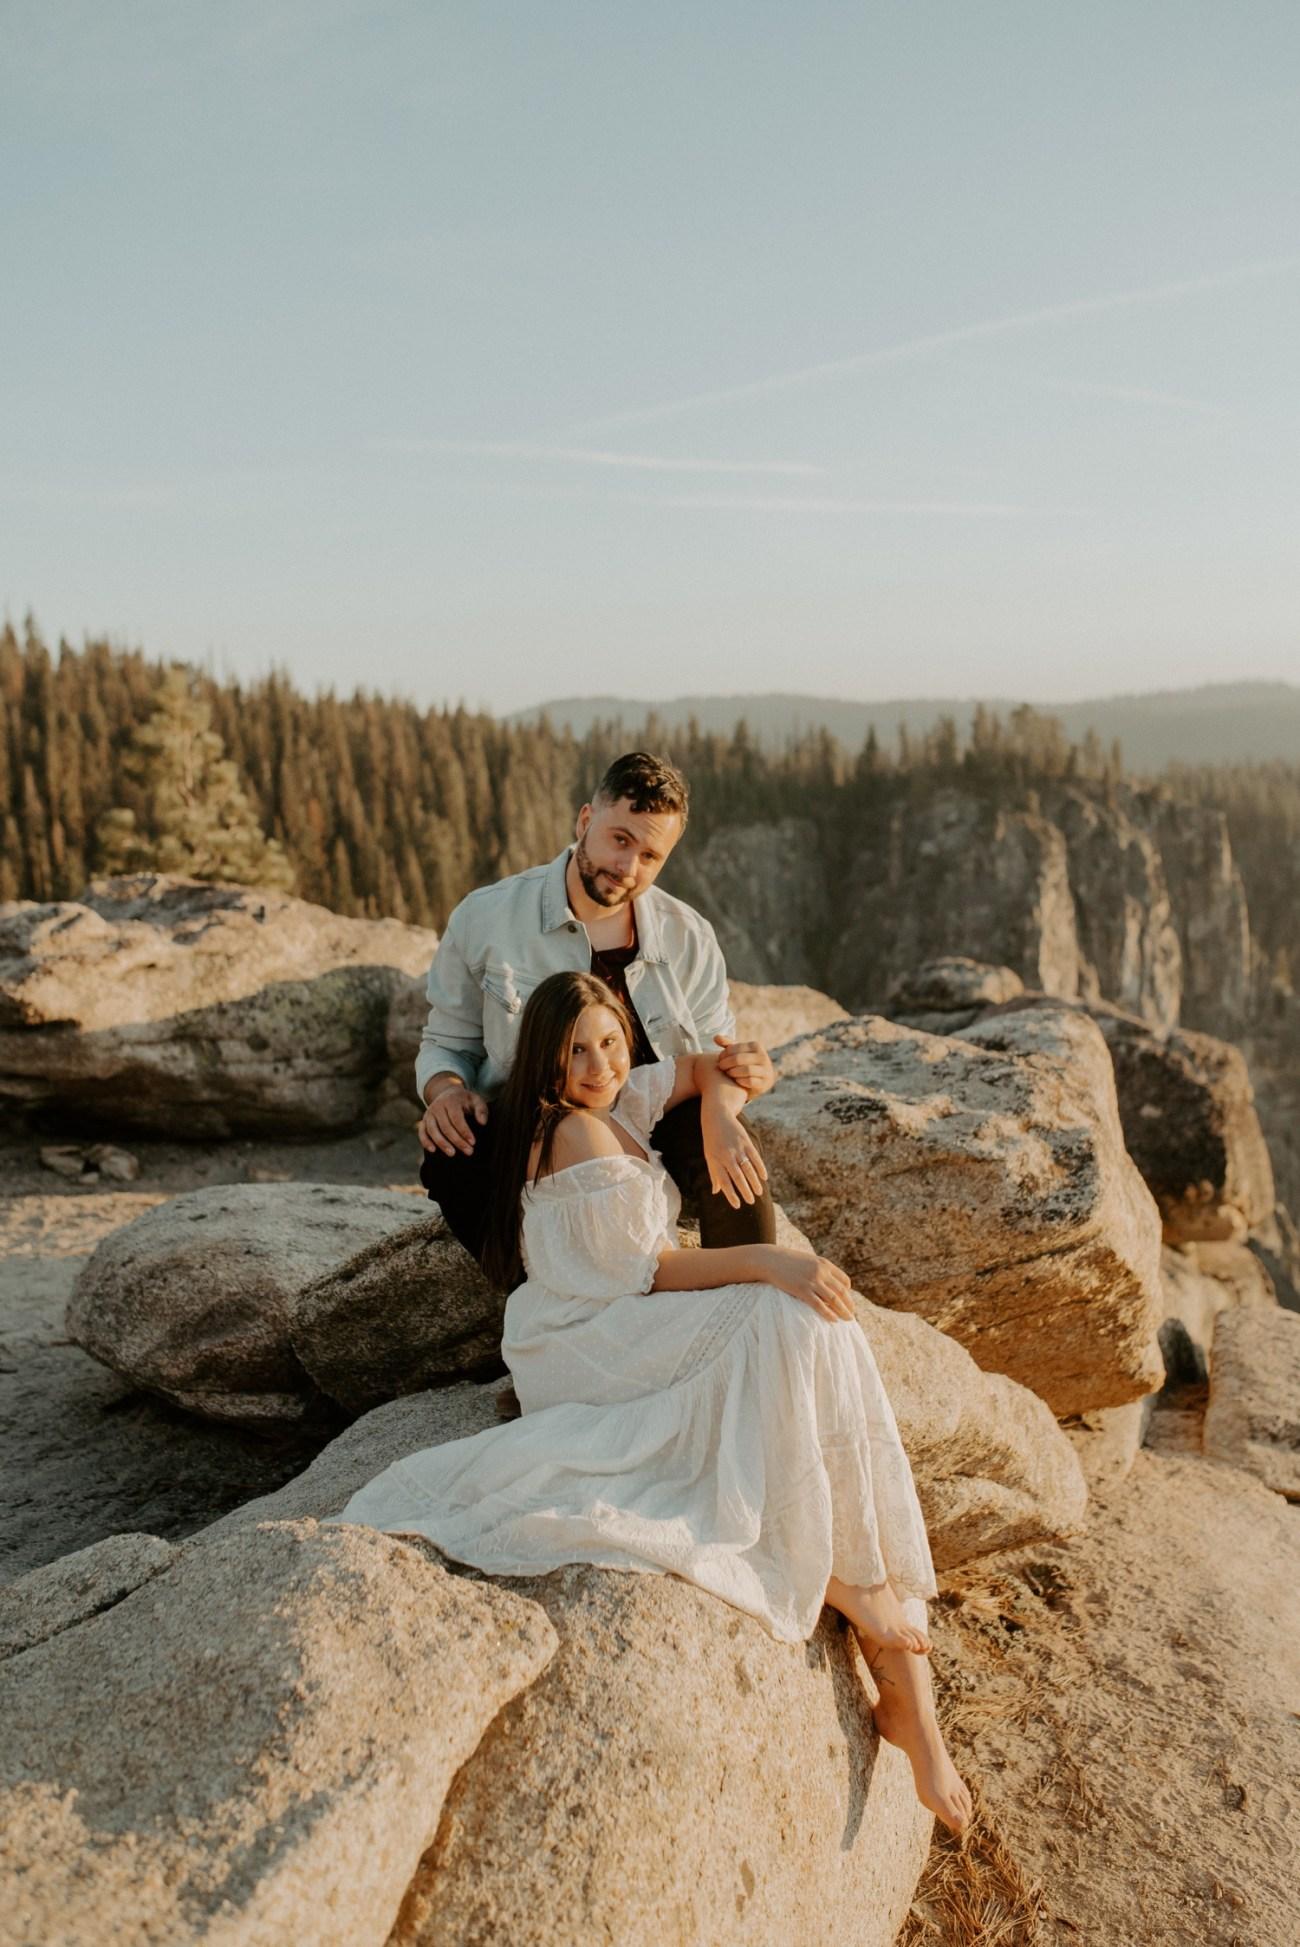 Yosemite Taft Point Engagement Session California Wedding Photographer Anais Possamai Photography 28